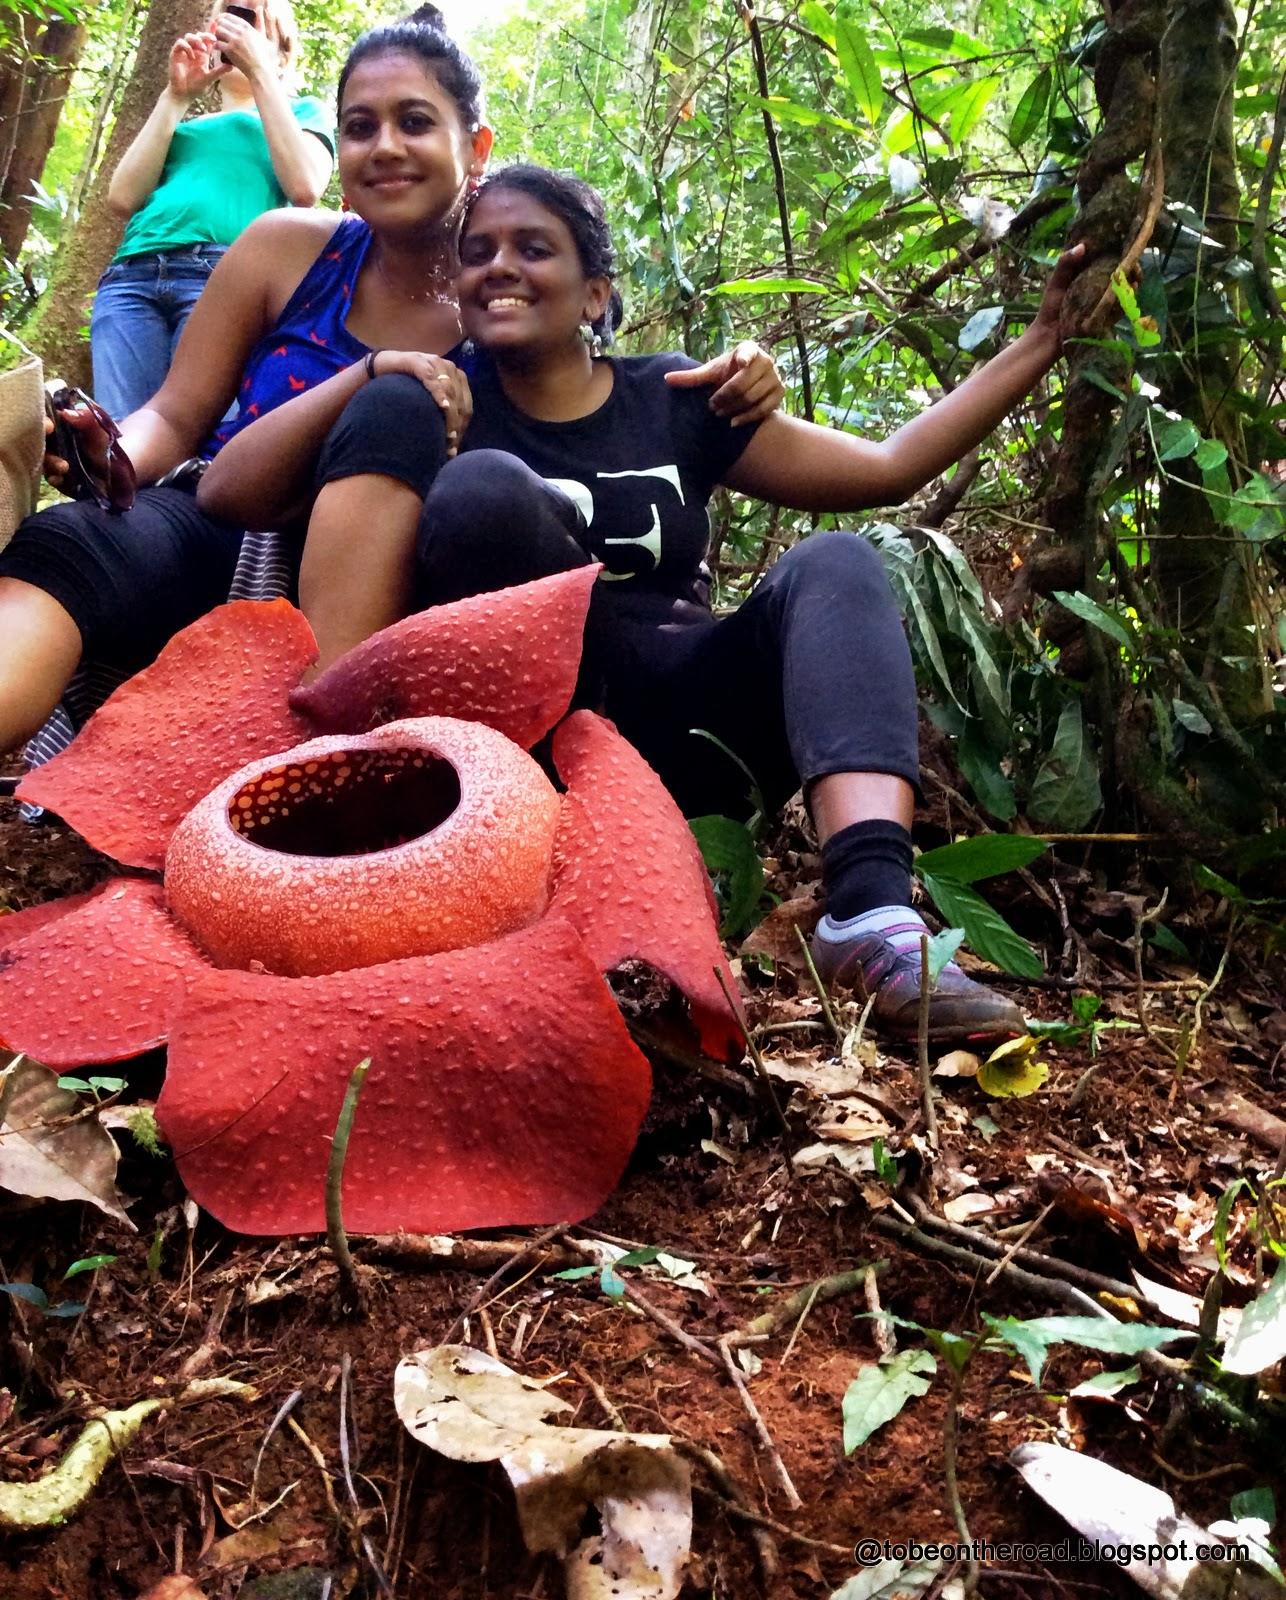 Rafflesia,Flower,Cameron